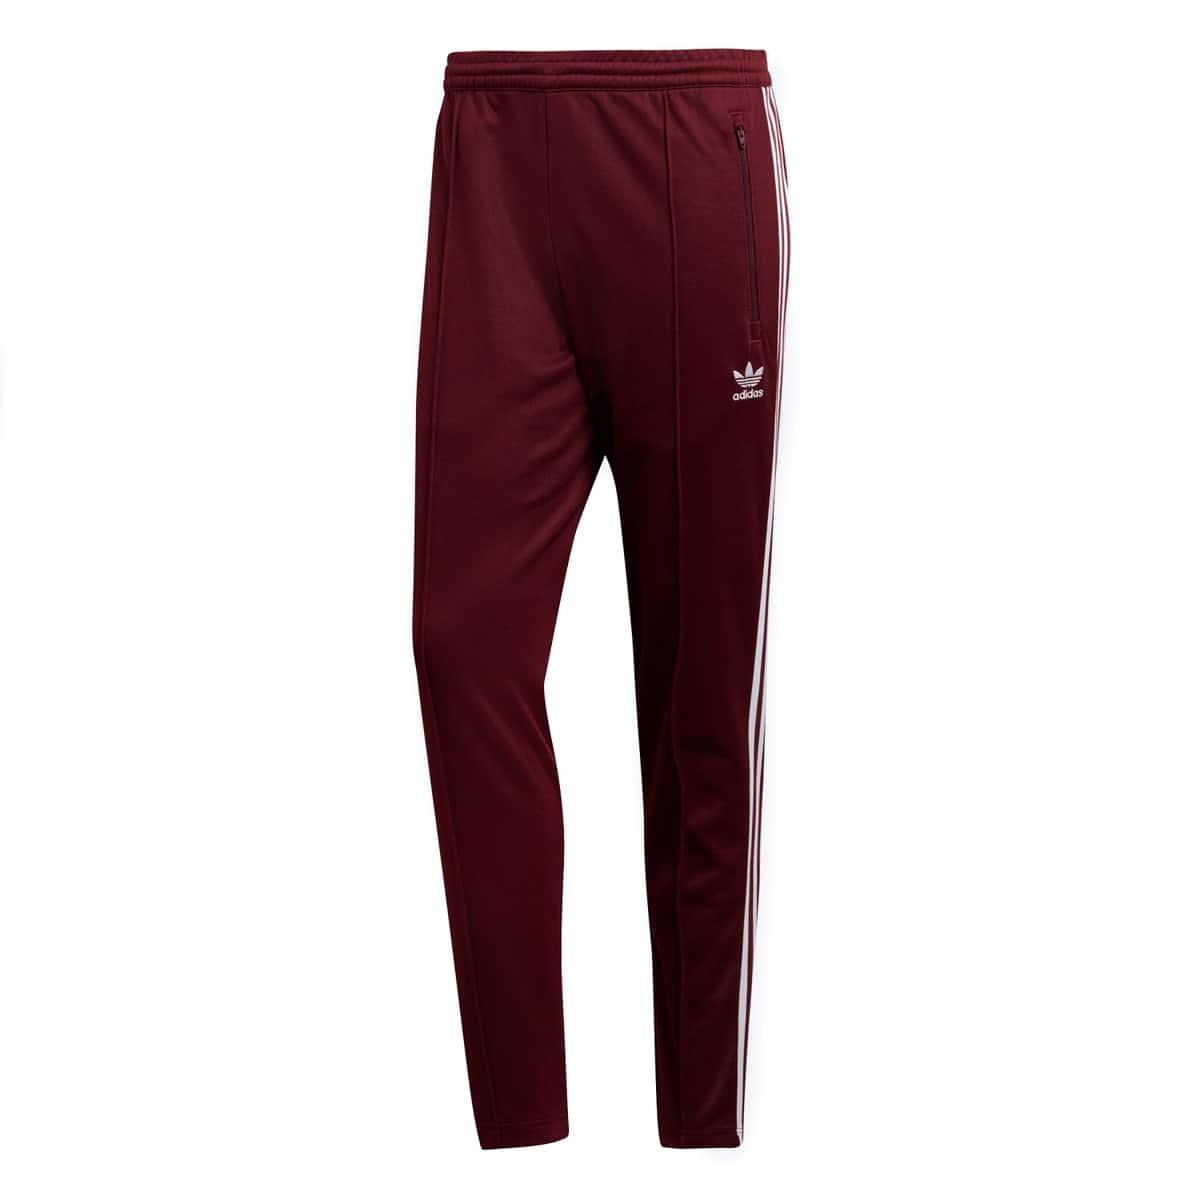 adidas BECKENBAUER TRACK PANTS マルーン 18FW-I_photo_large